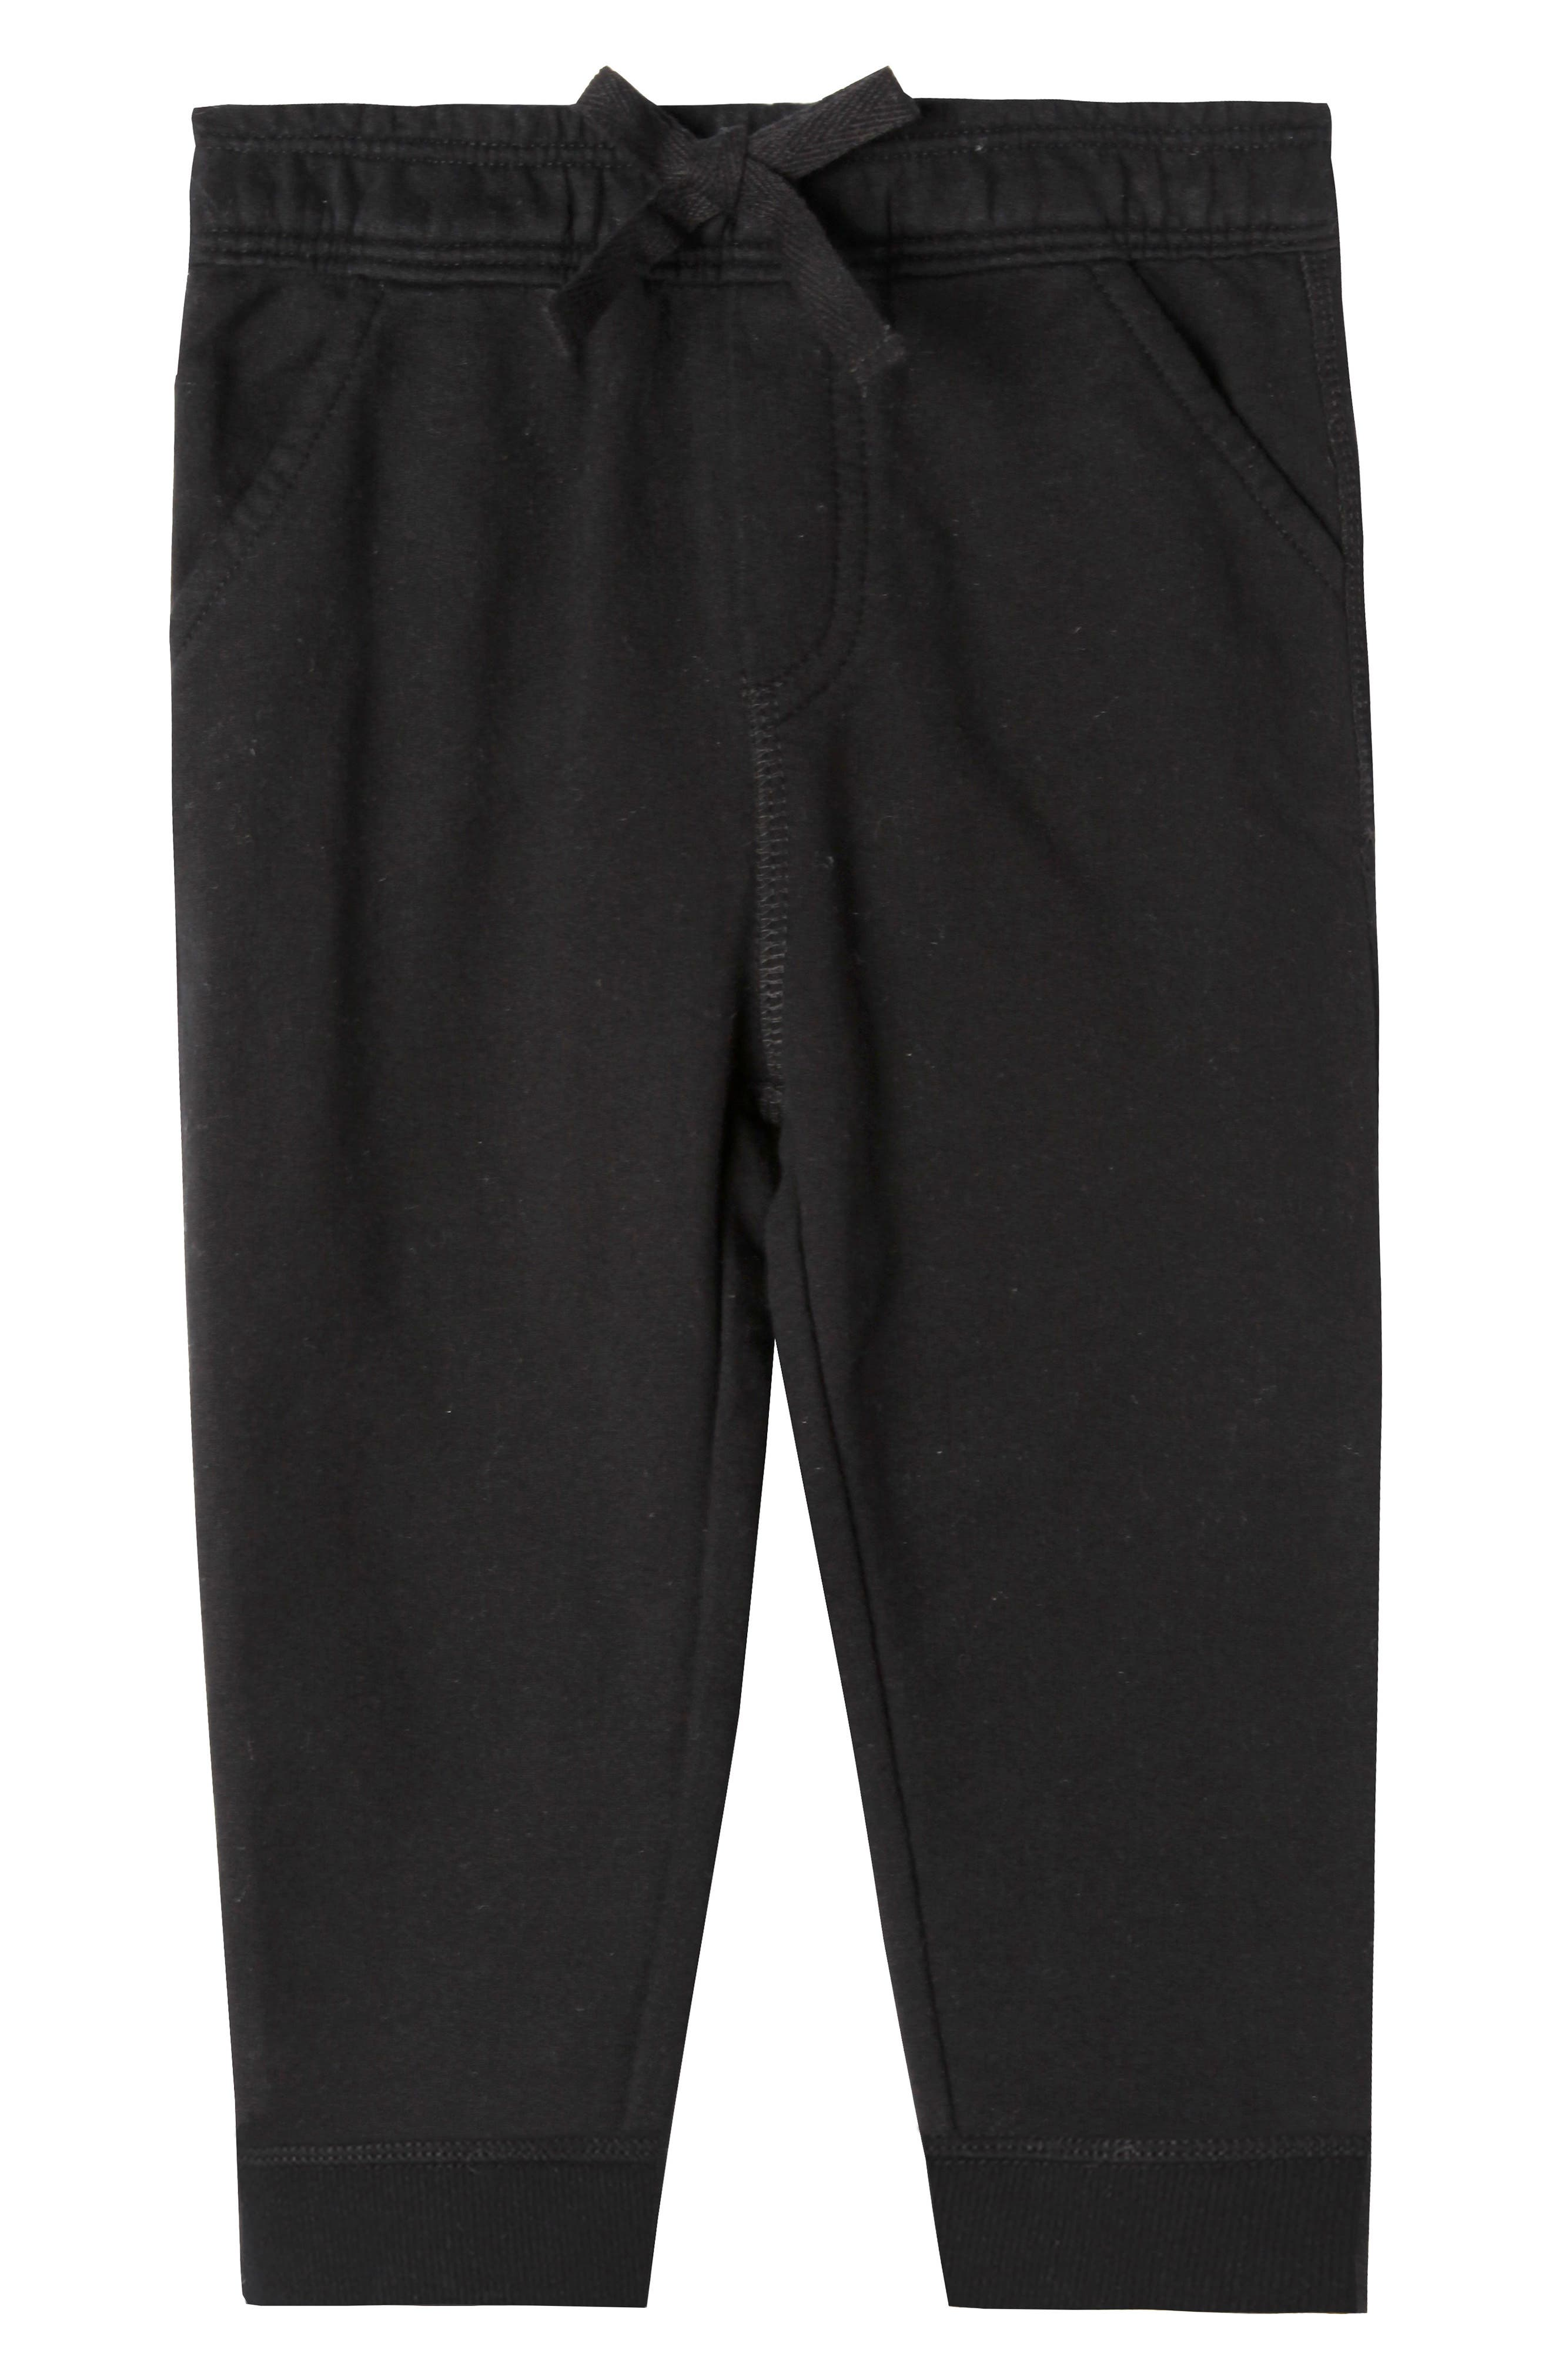 Joseph Organic Cotton Pants,                         Main,                         color, Black